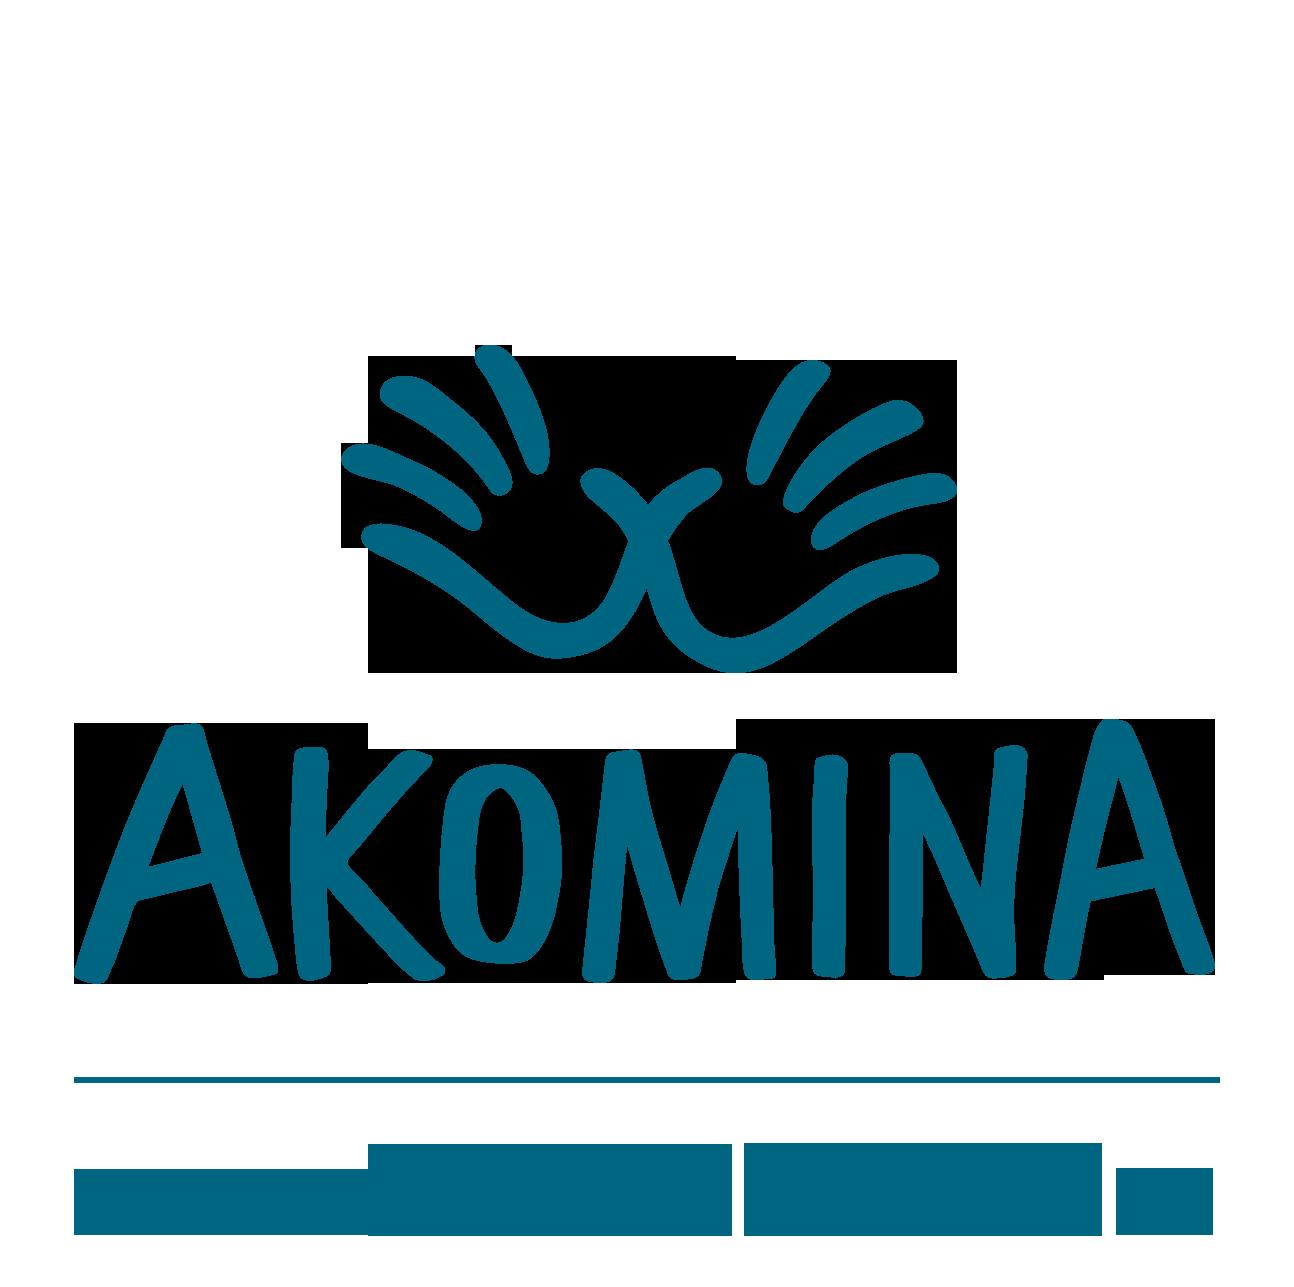 Akomina